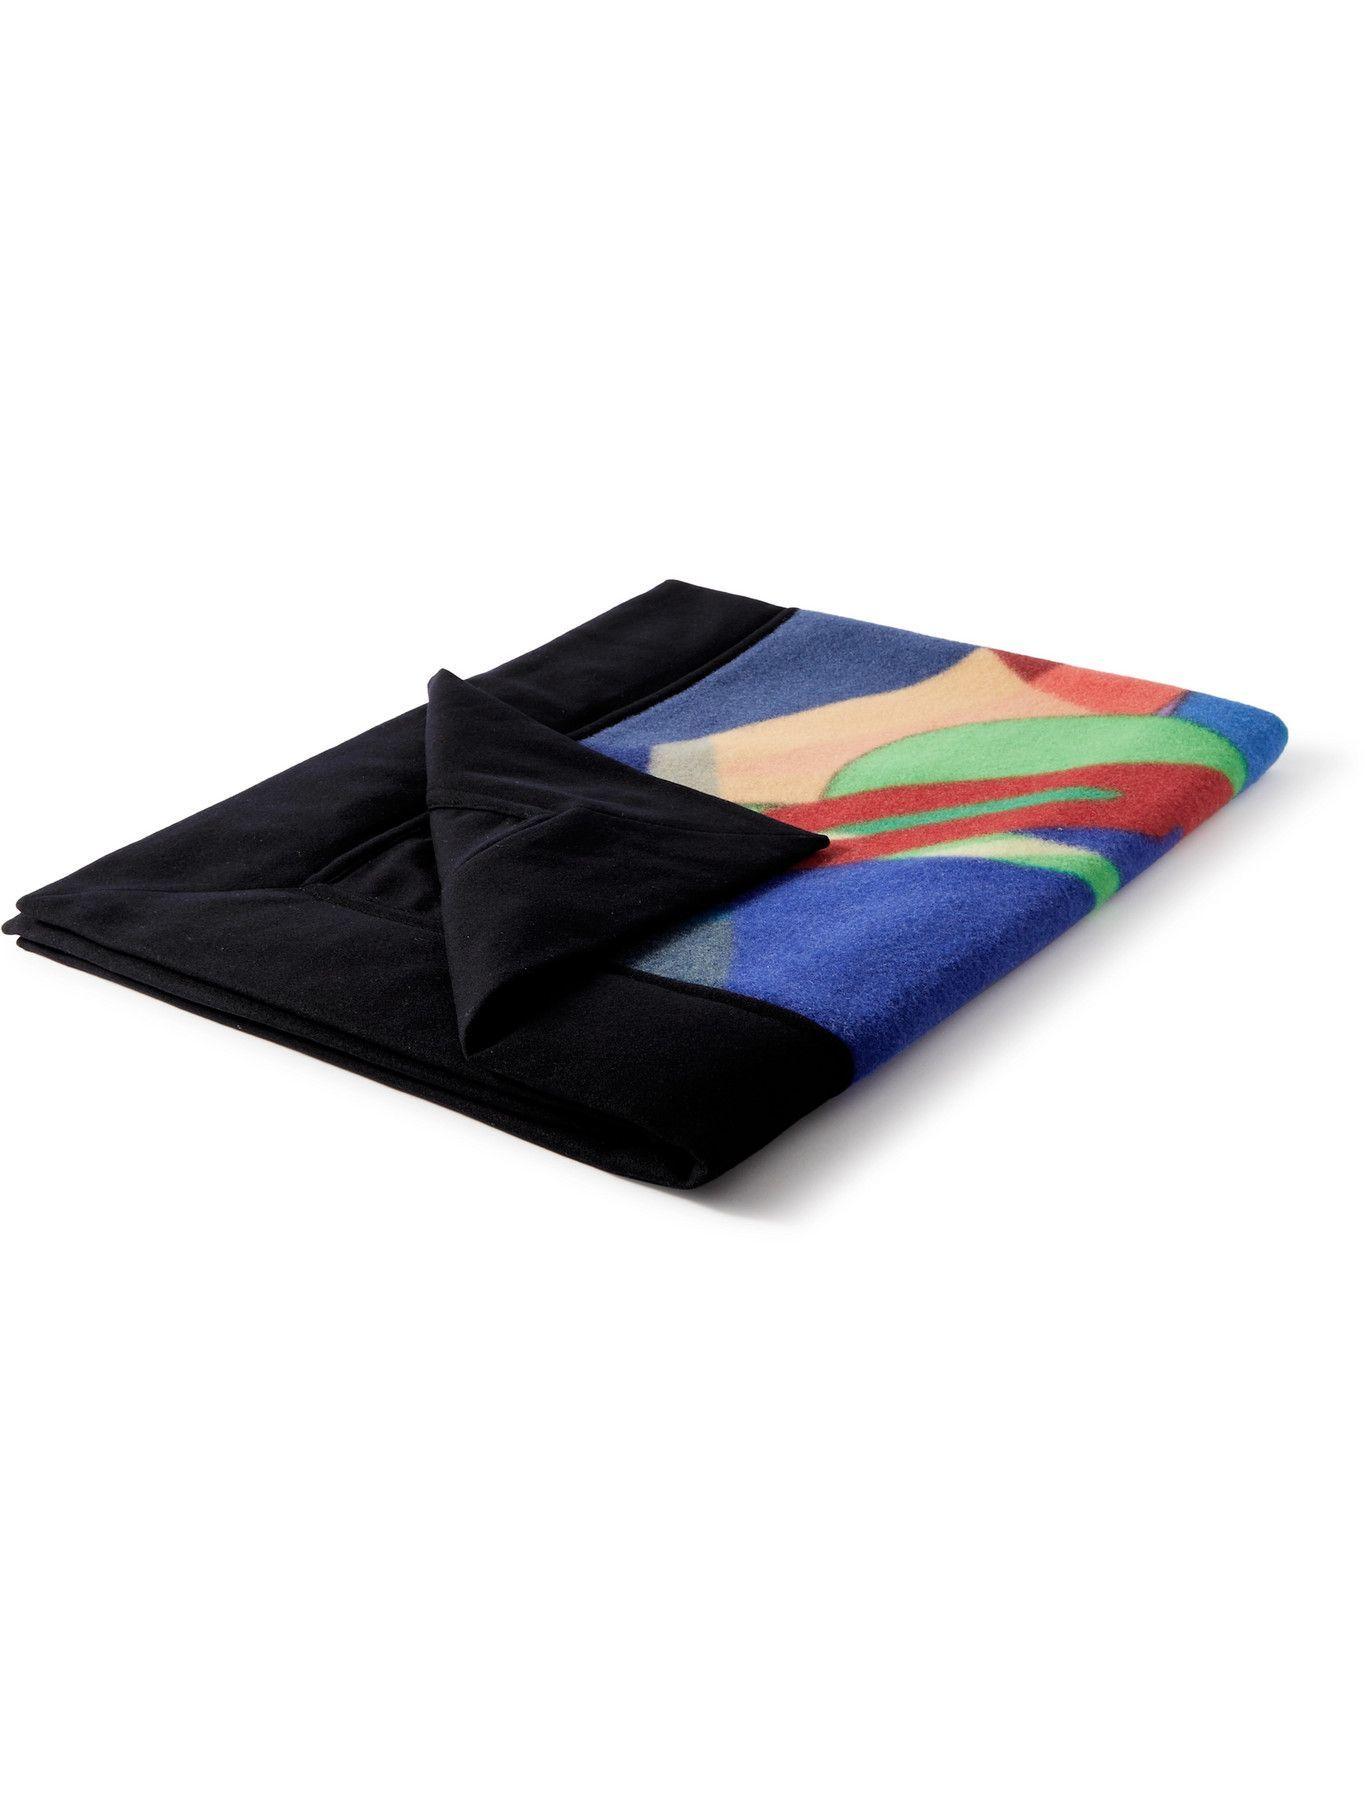 Sacai - KAWS Wool-Blend Jacquard Throw